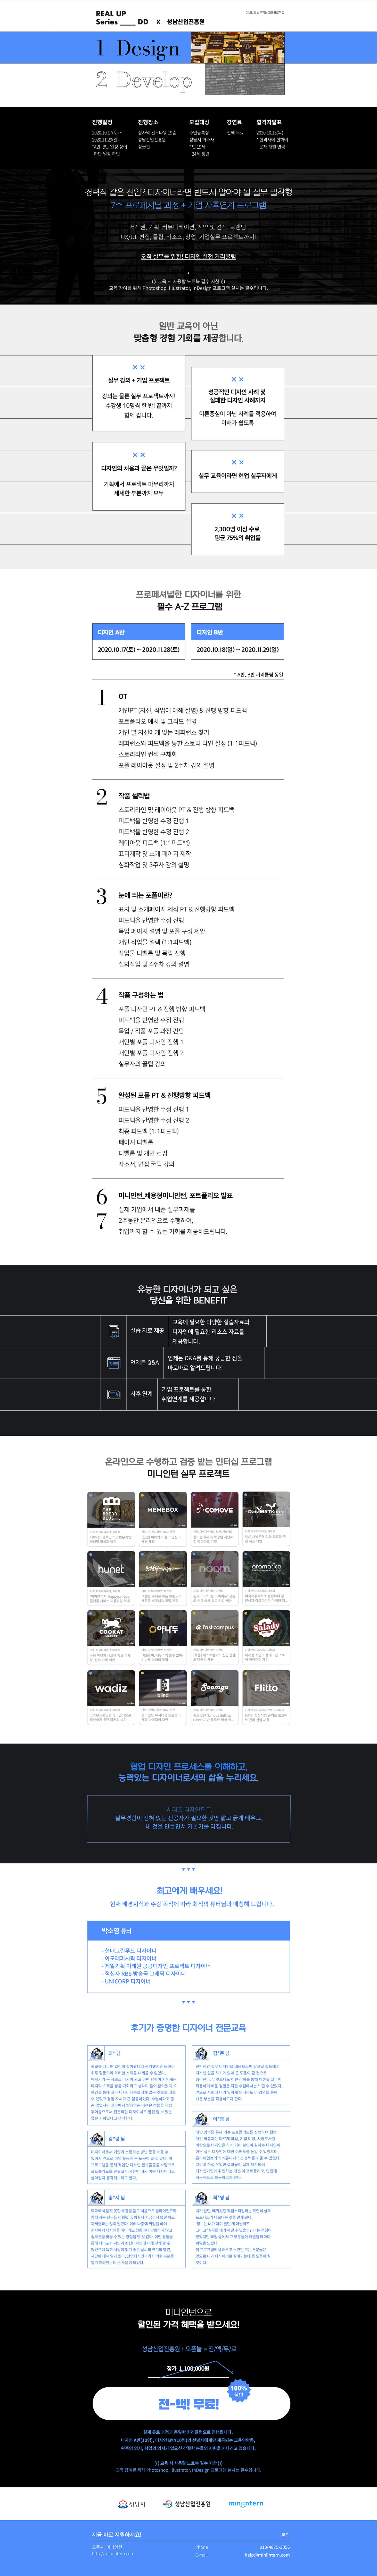 Series DD X 성남산업진흥원 디자이너 포트폴리오 완성반